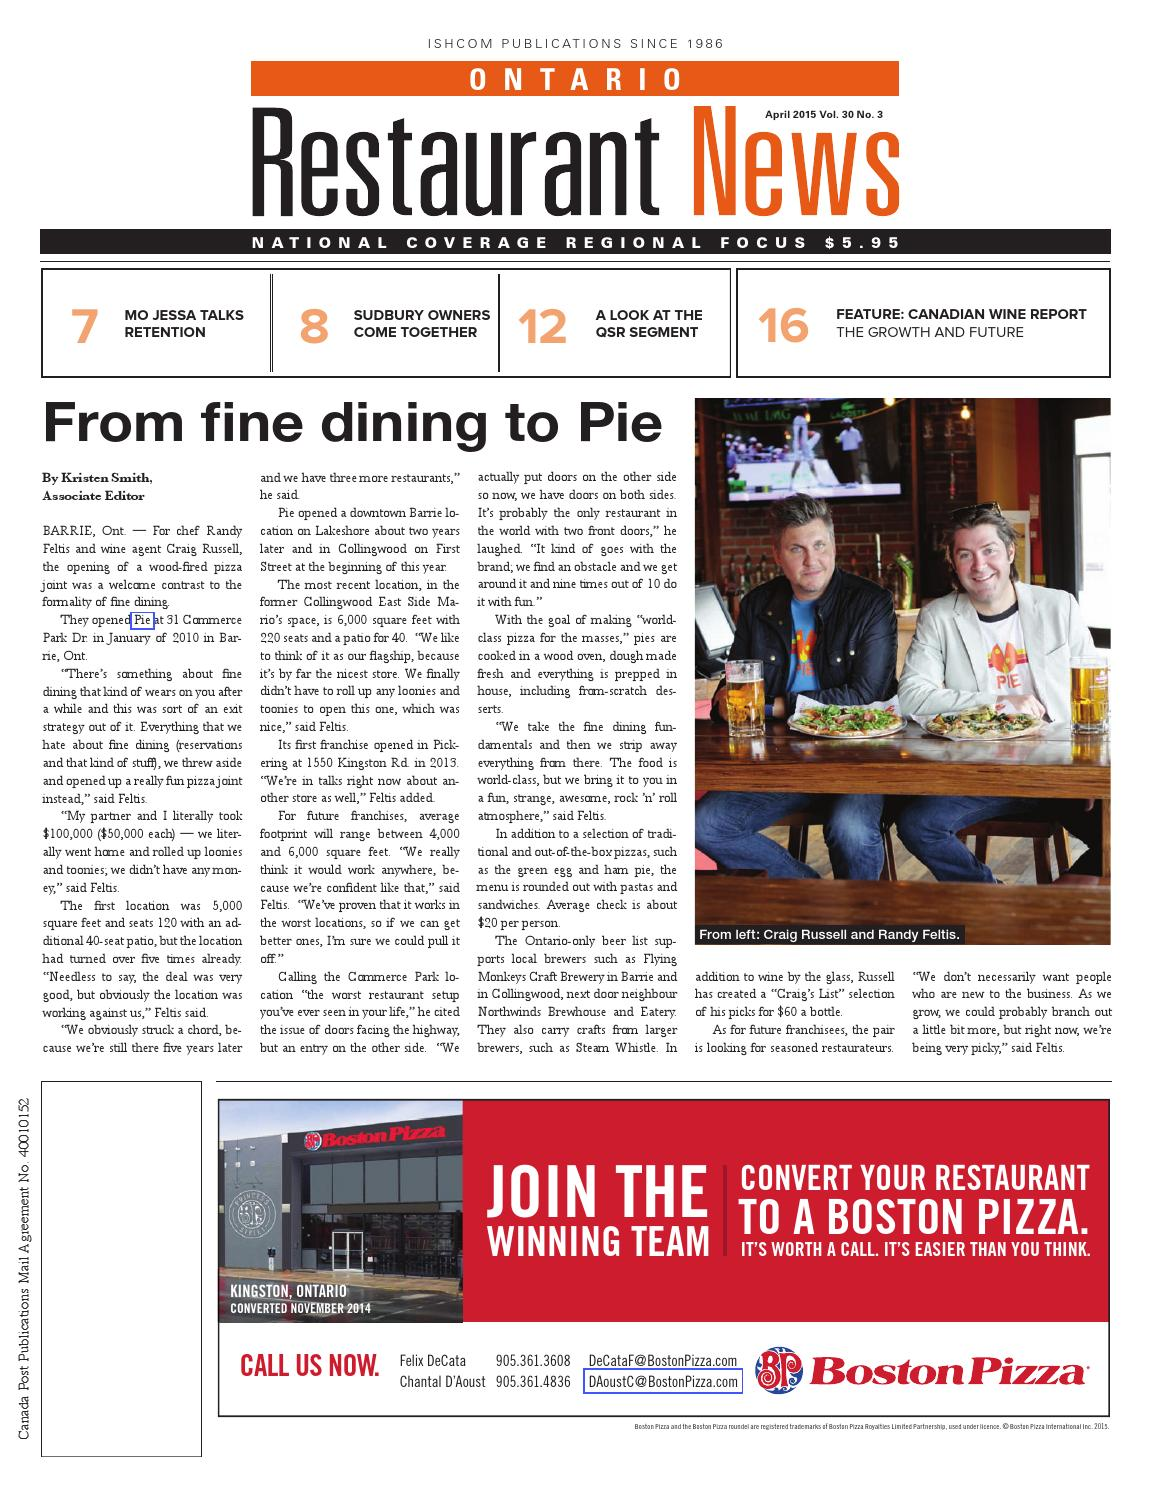 Ontario Restaurant News - April 2015 by Ishcom Publications - issuu